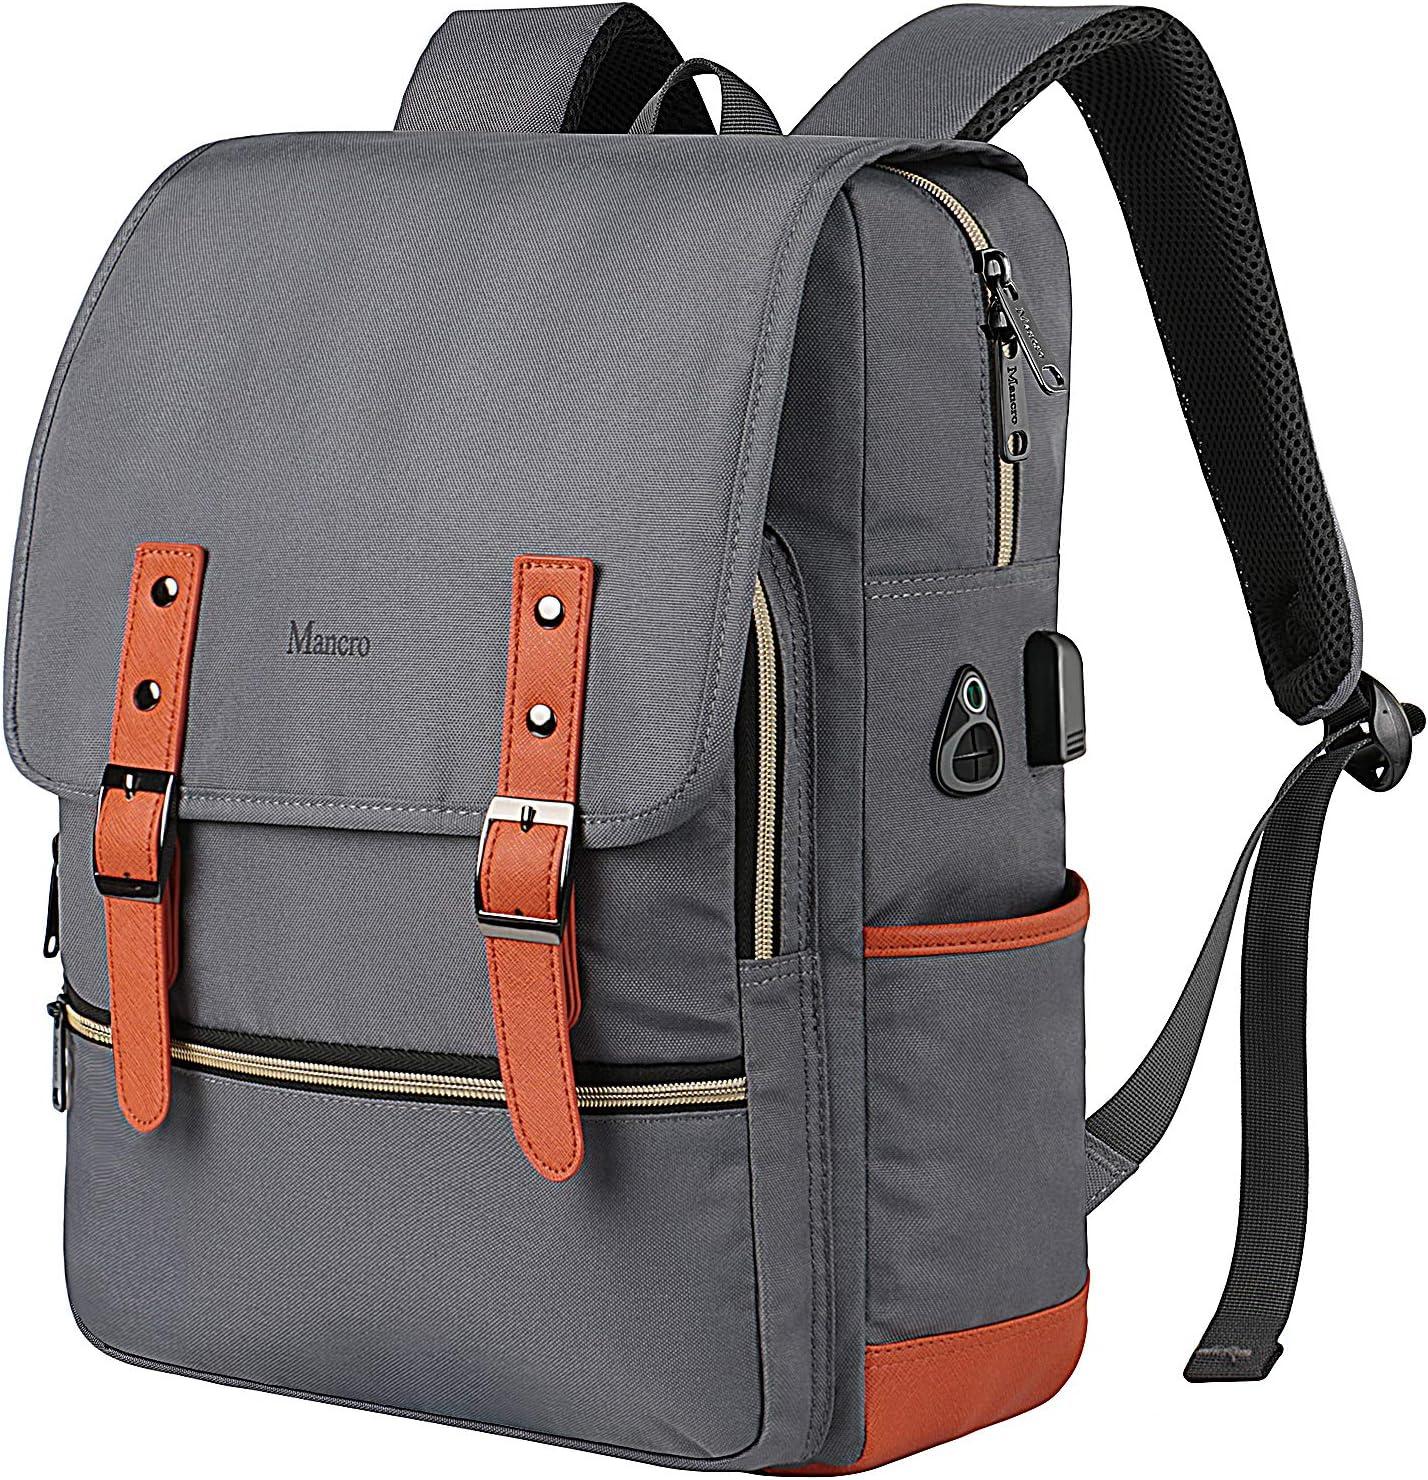 Vintage Laptop Backpack,Waterproof School College Backpack for Women Men with USB Charging Port Mancro Lightweight Travel Bag Fits 15.6 Inch Notebook Grey